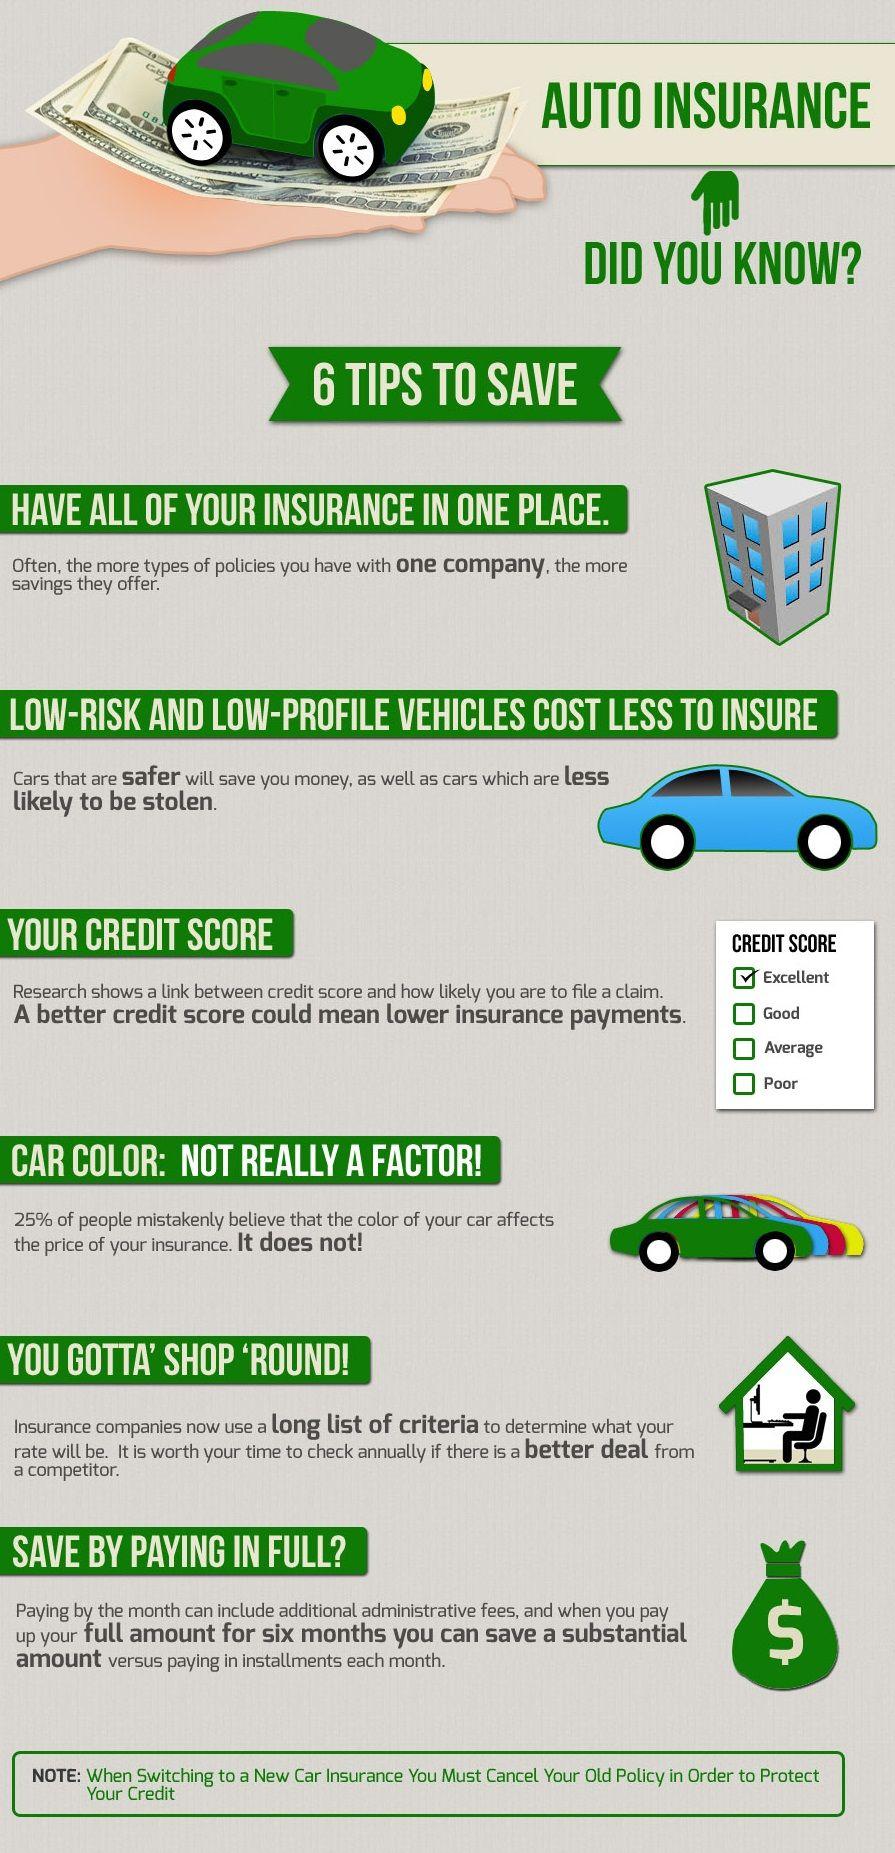 Buy or renew car insurance policies online. Buy car